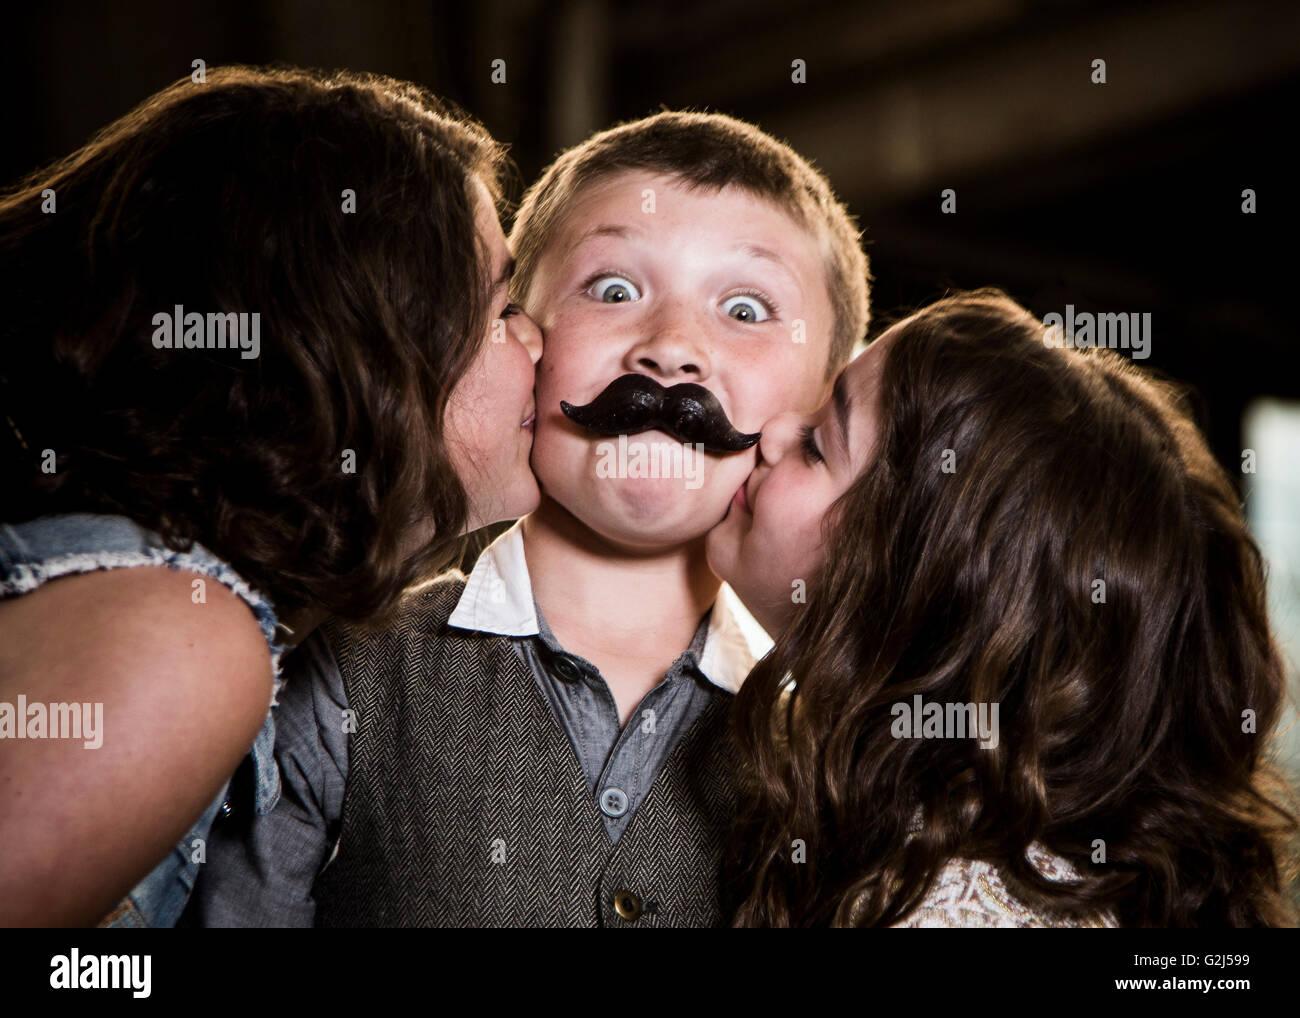 Children Kissing Stock Photos  Children Kissing Stock Images - Alamy-4592